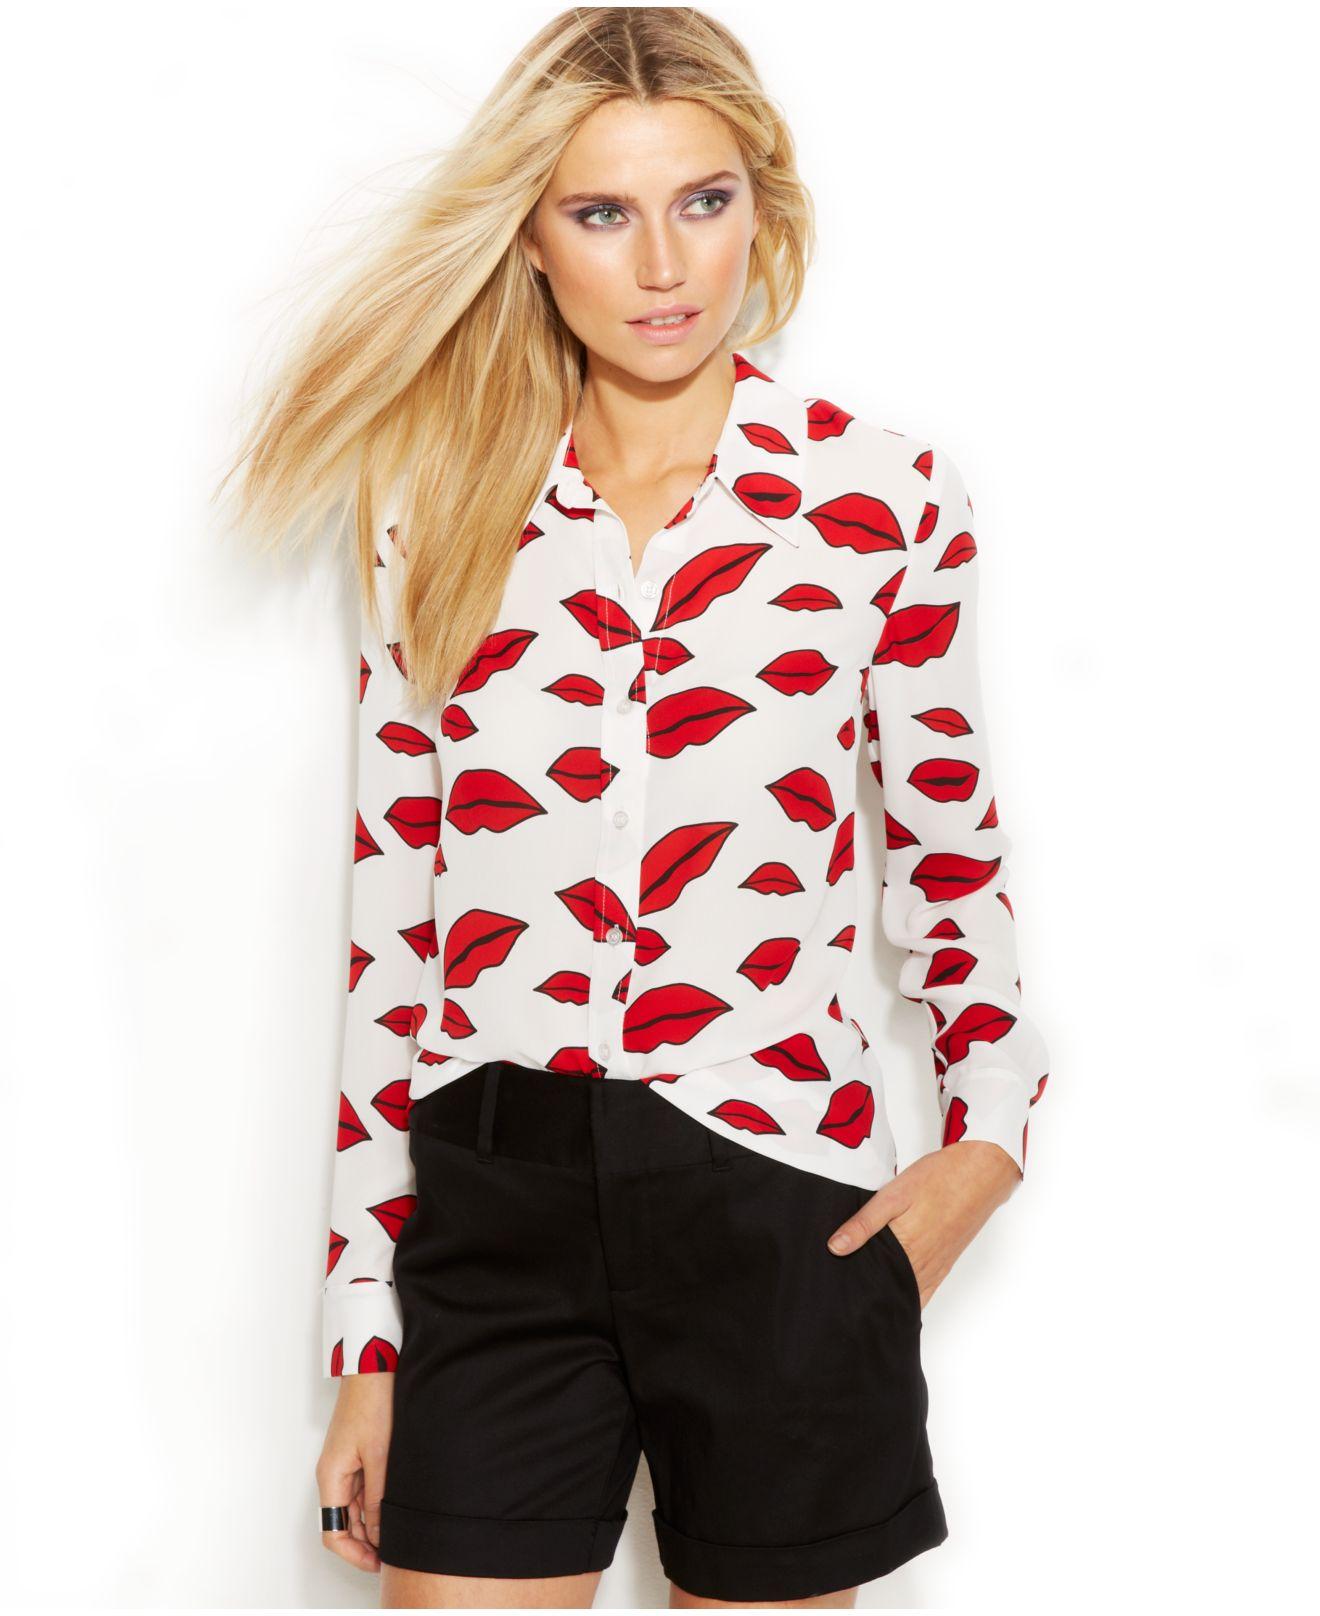 Macys Womens Shirts